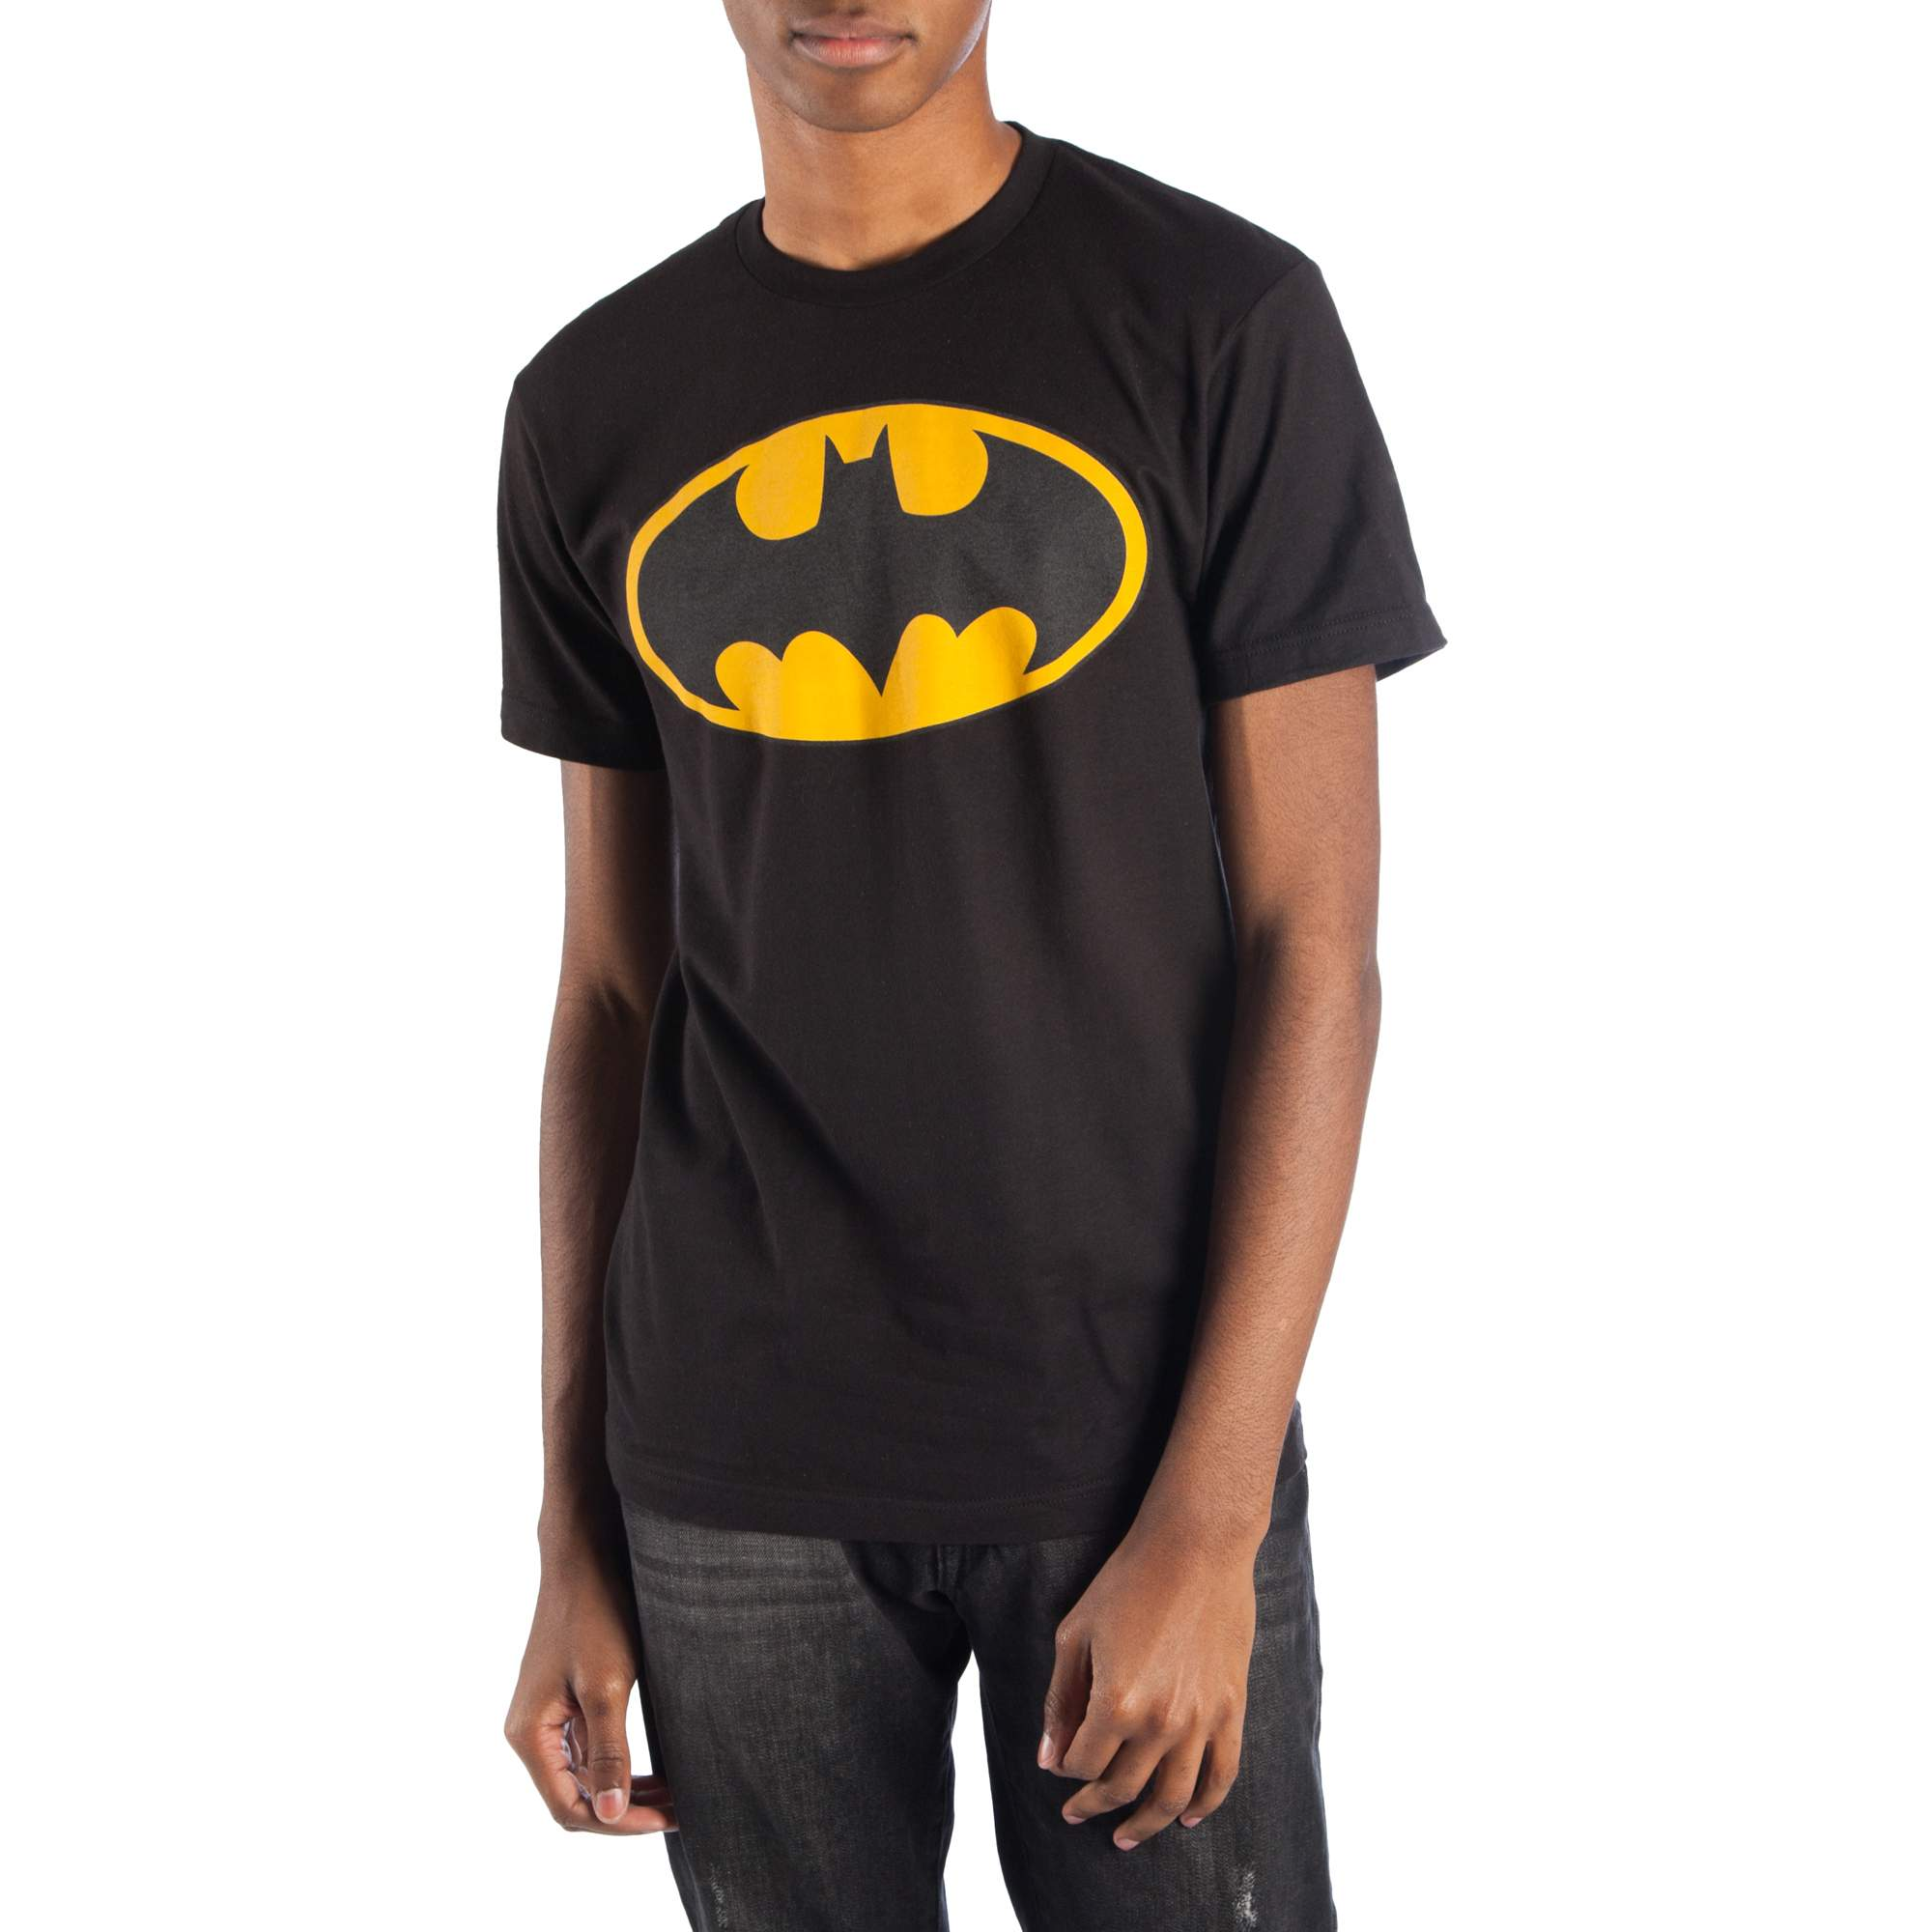 Big Men's Black DC Comics Reflective Batman Logo Short Sleeve Tee by Bioworld Merchandising